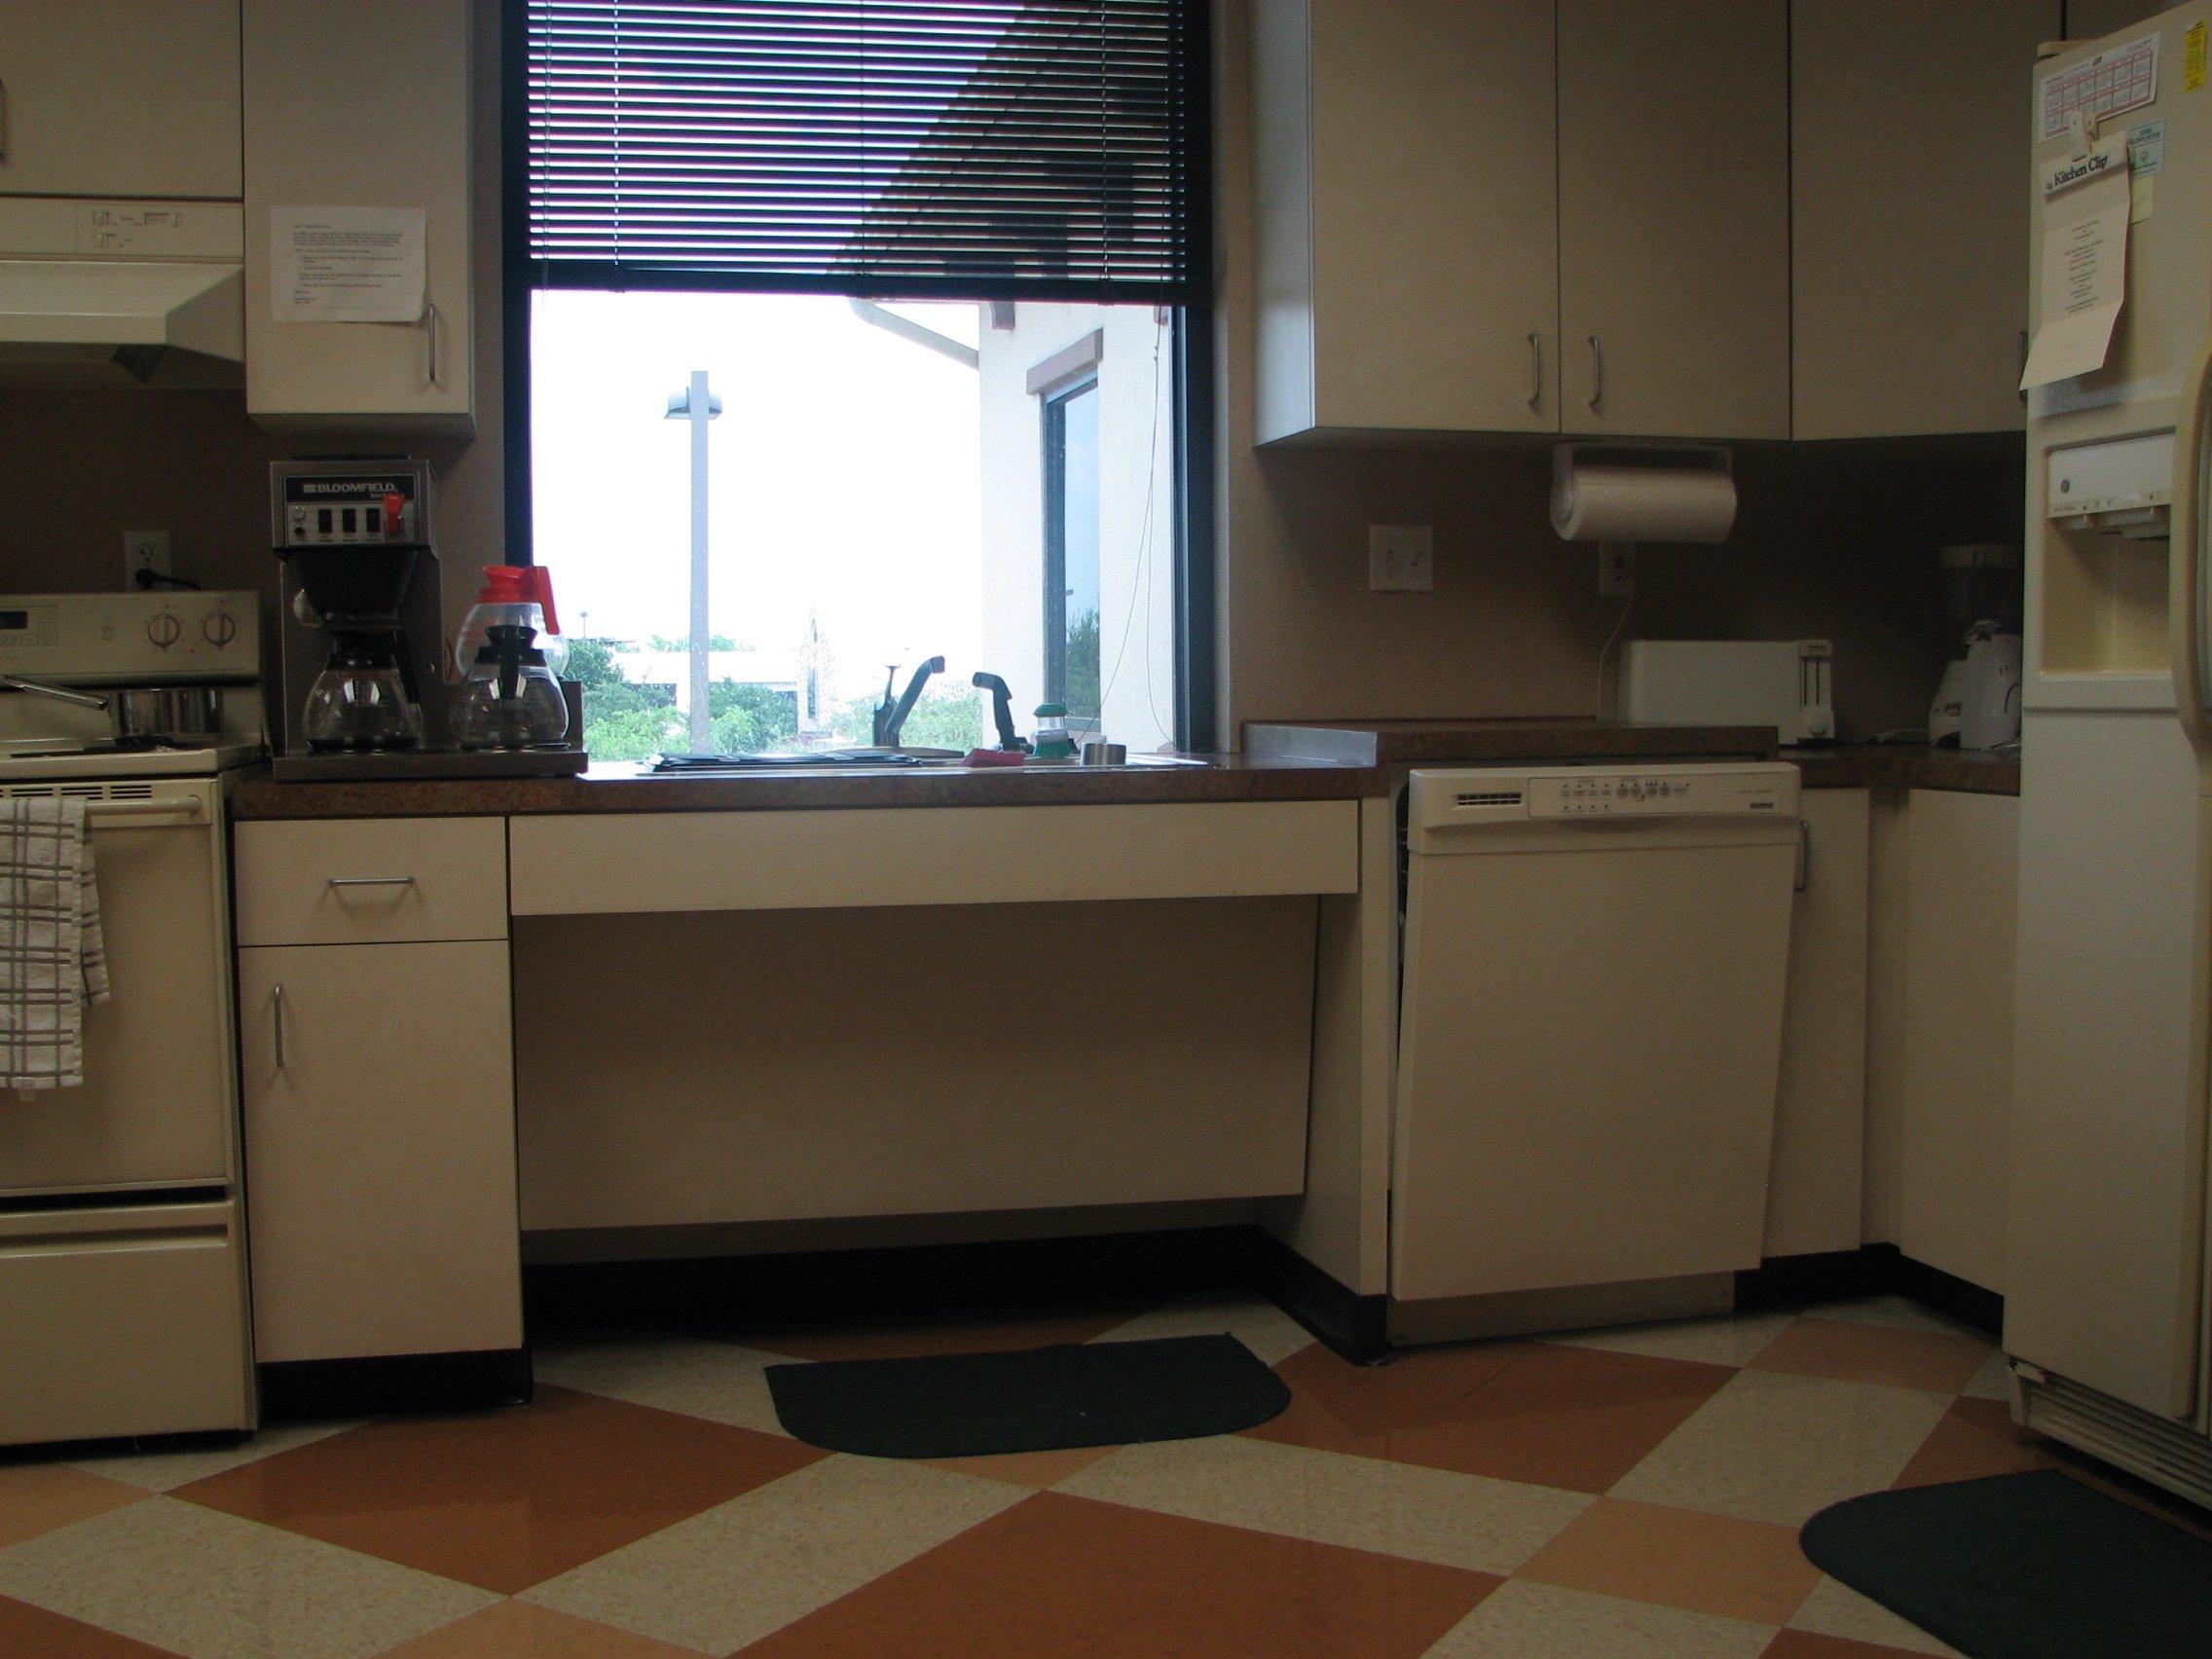 Ada Compliant Kitchen Cabinets In Austin Texas